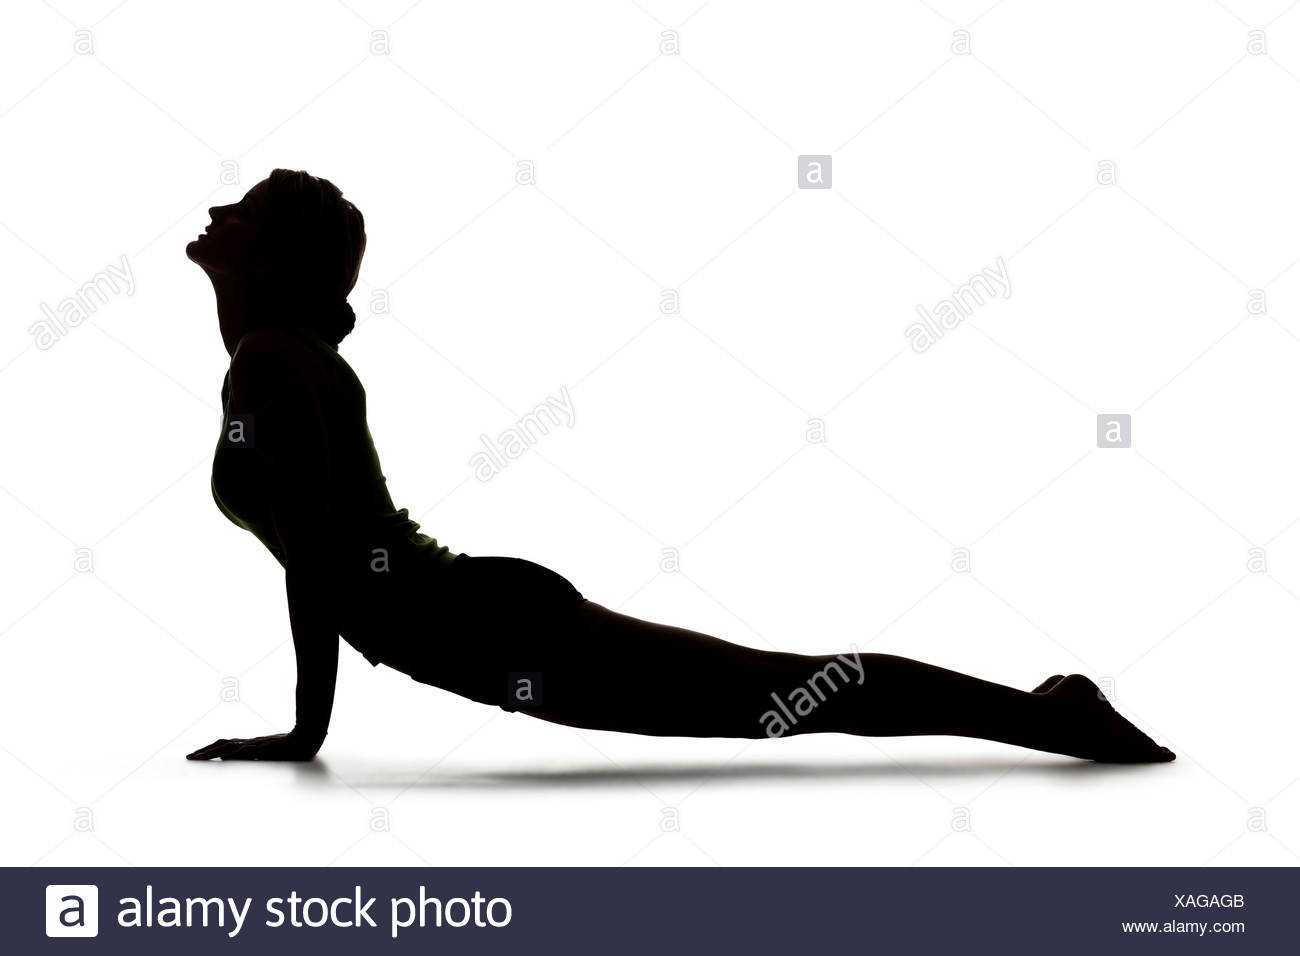 1300x956 Usa, Utah, Orem, Silhouette Of Woman In Cobra Pose Against White